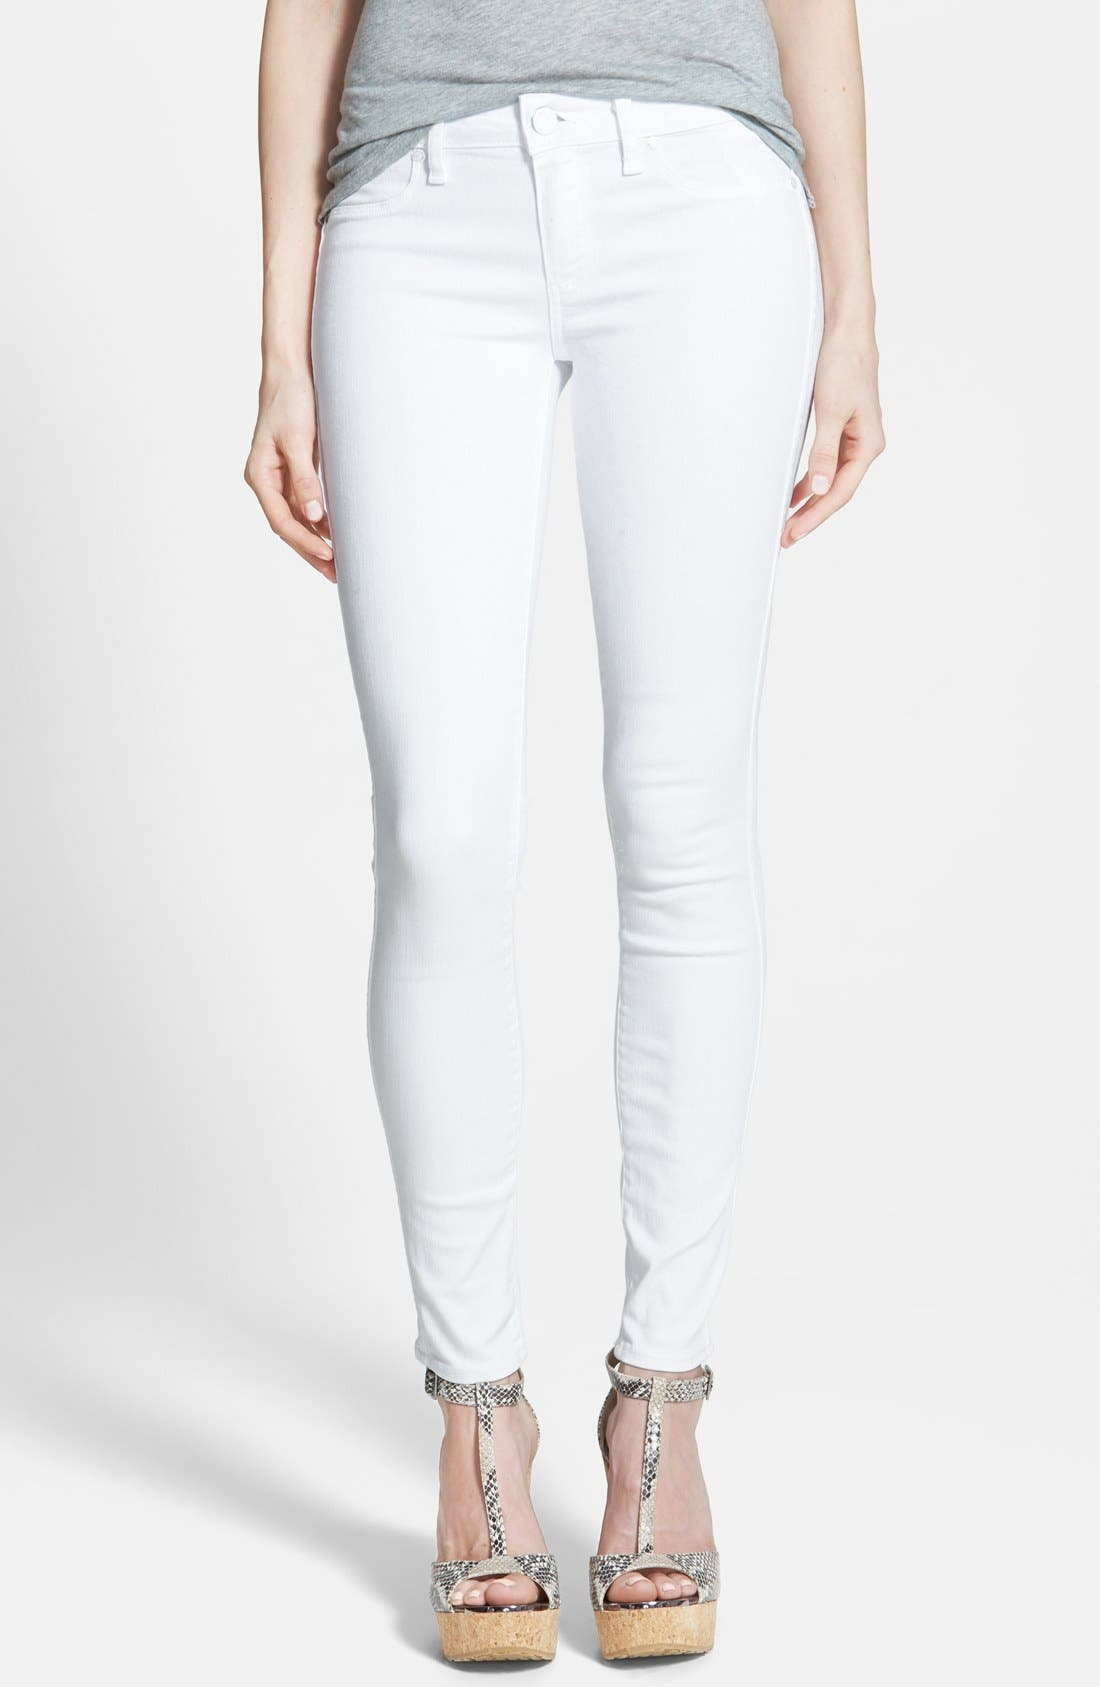 PAIGE 'Verdugo' Ultra Skinny Jeans, Main, color, 100